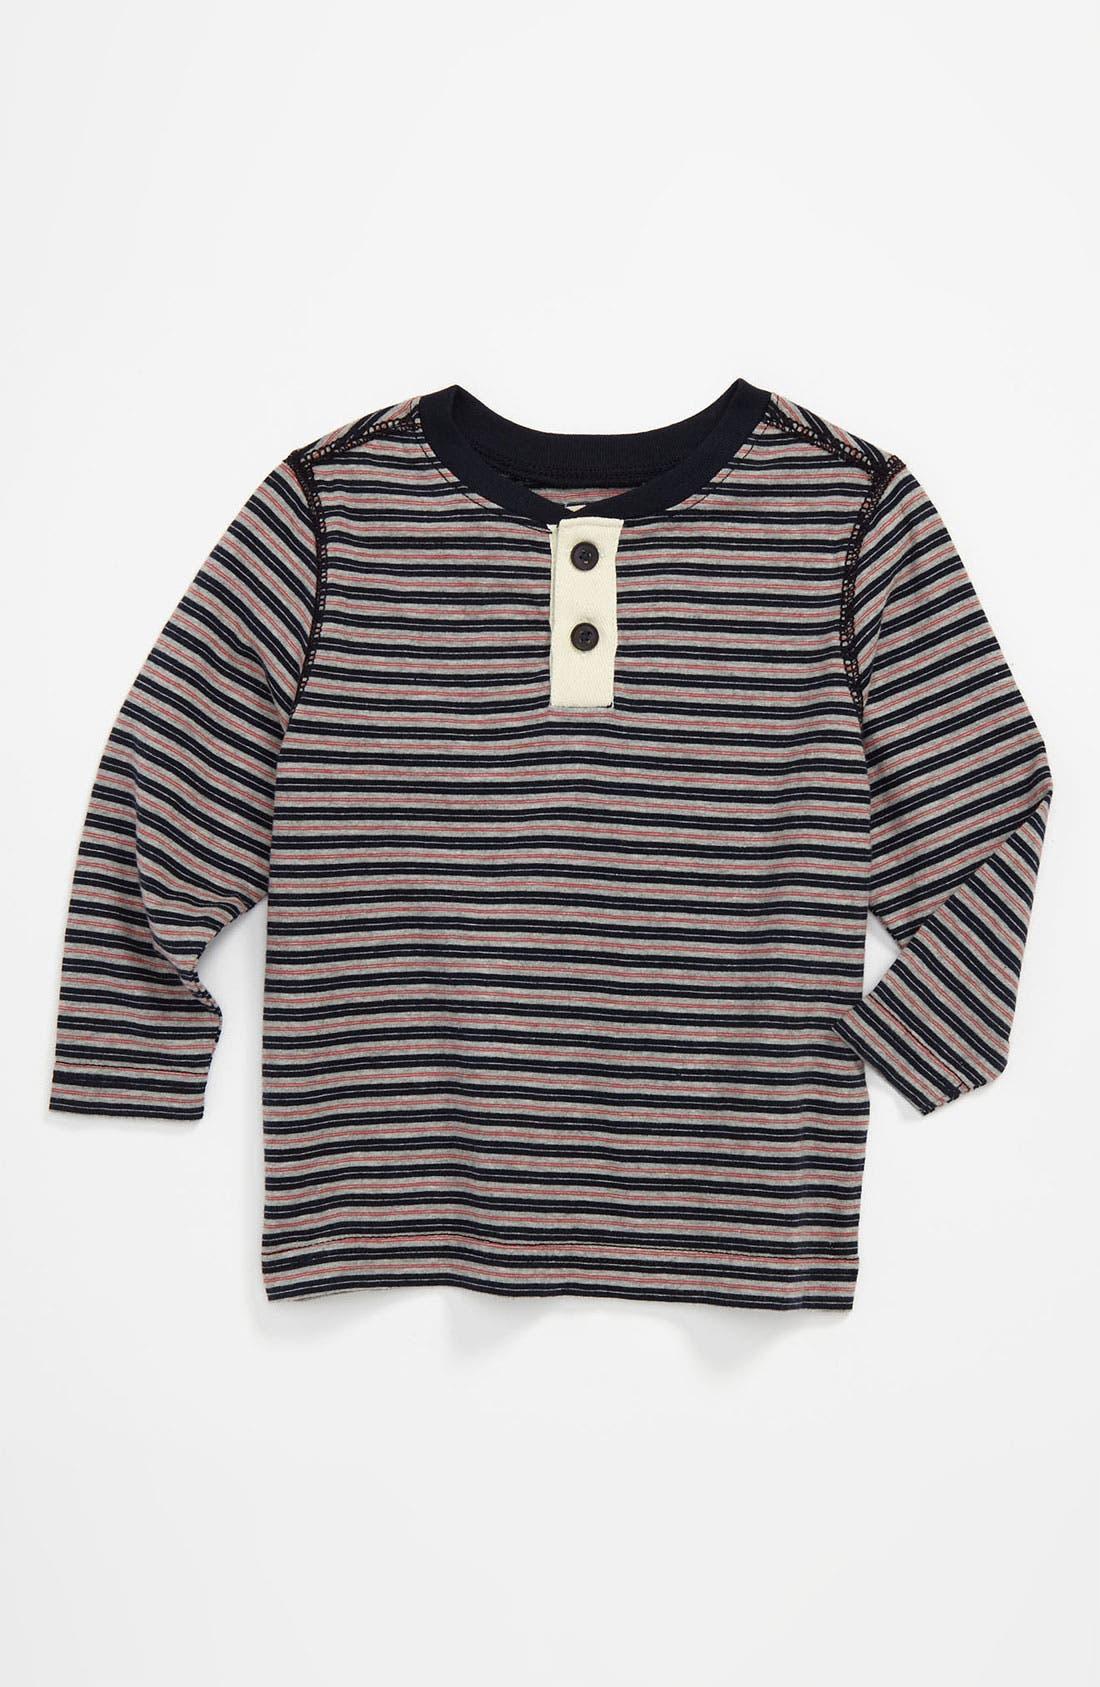 Alternate Image 1 Selected - Peek 'Rawley' Stripe Henley (Infant)